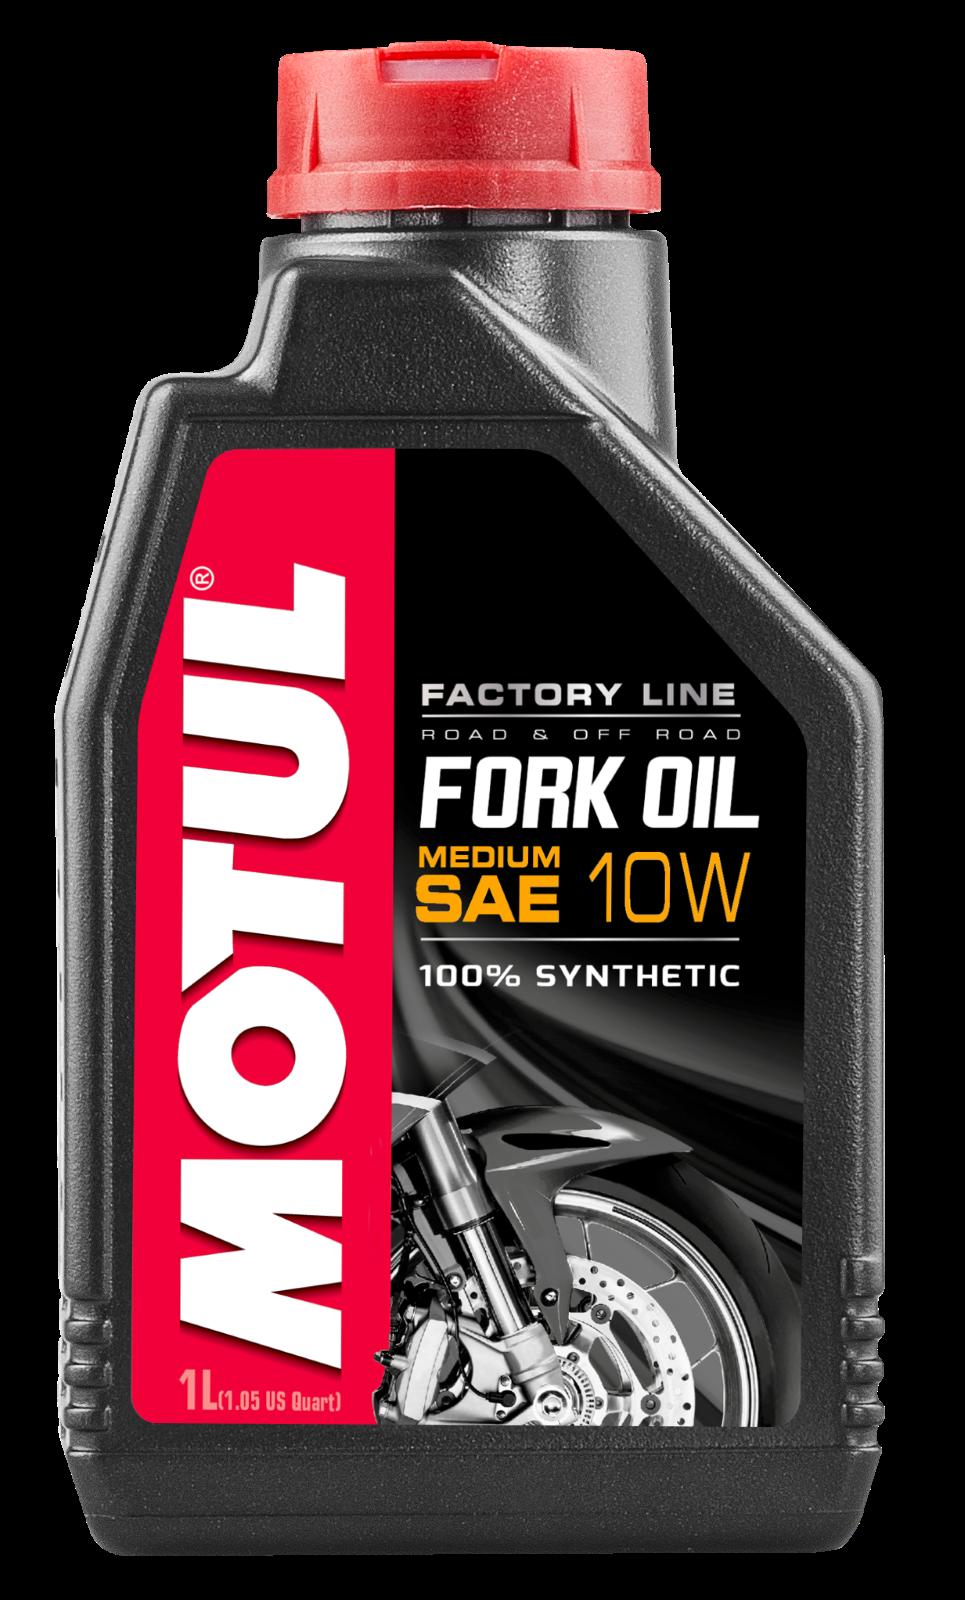 MOTUL AG MOTUL Fork Oil Factory Line 10W 1L Teleszkóp olaj, villaolaj